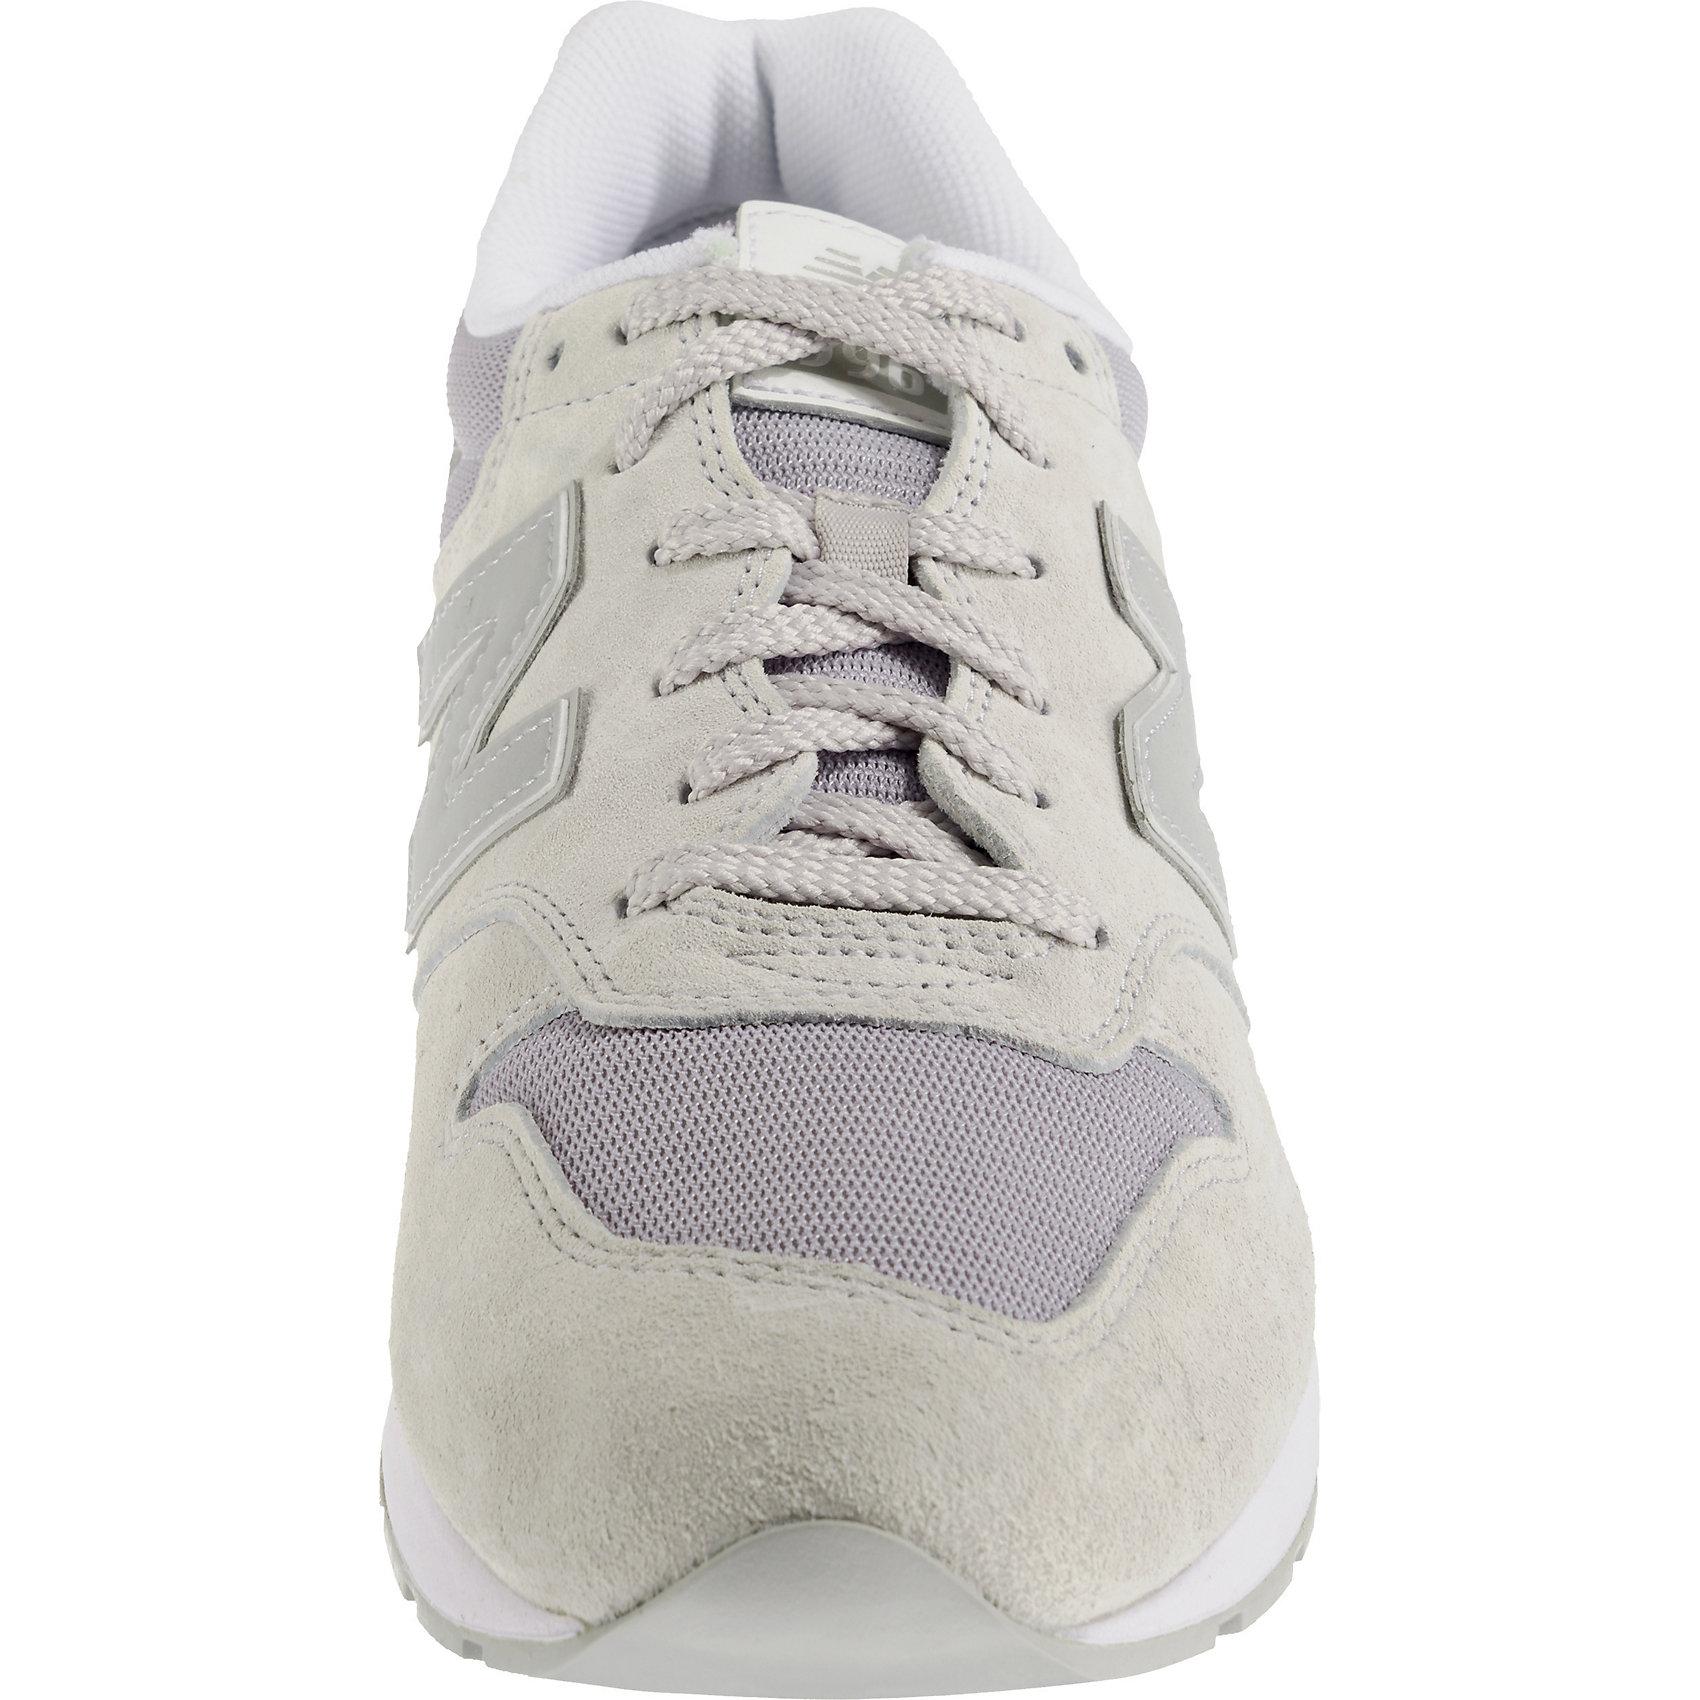 Neu new 7967021 balance MRL996 Sneakers Low 7967021 new für Herren weiß f3e3bf